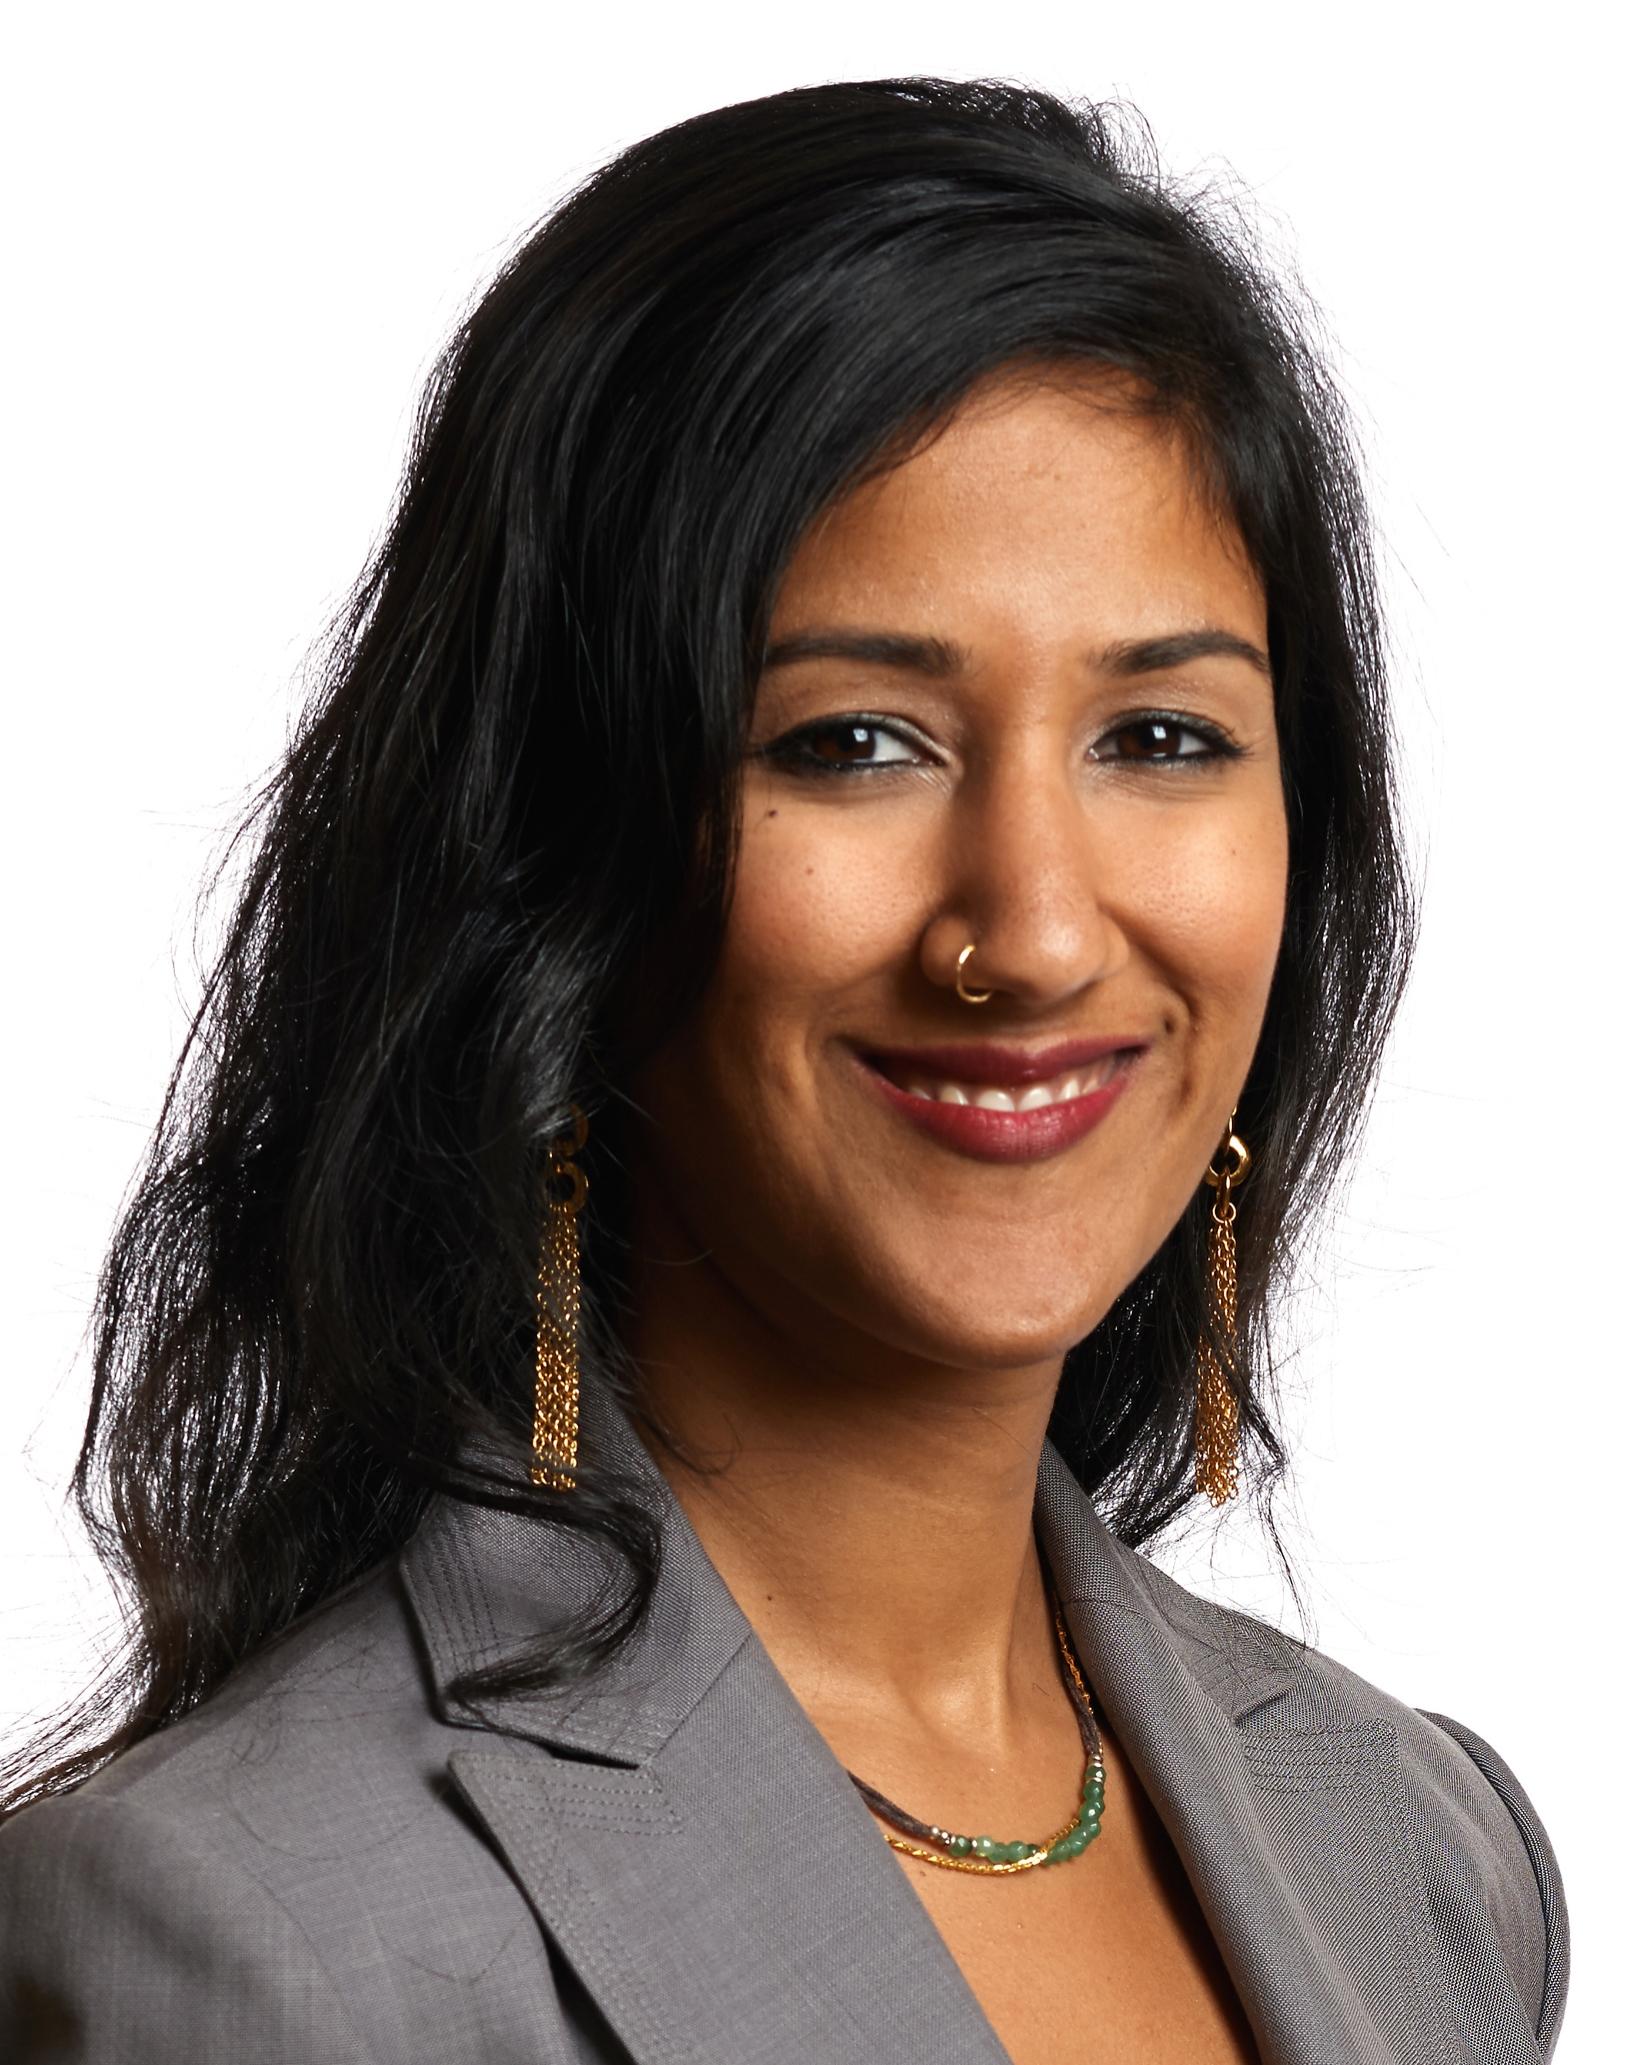 Meena Jagannath, Co-Founder, Community Justice Project, @meenajag